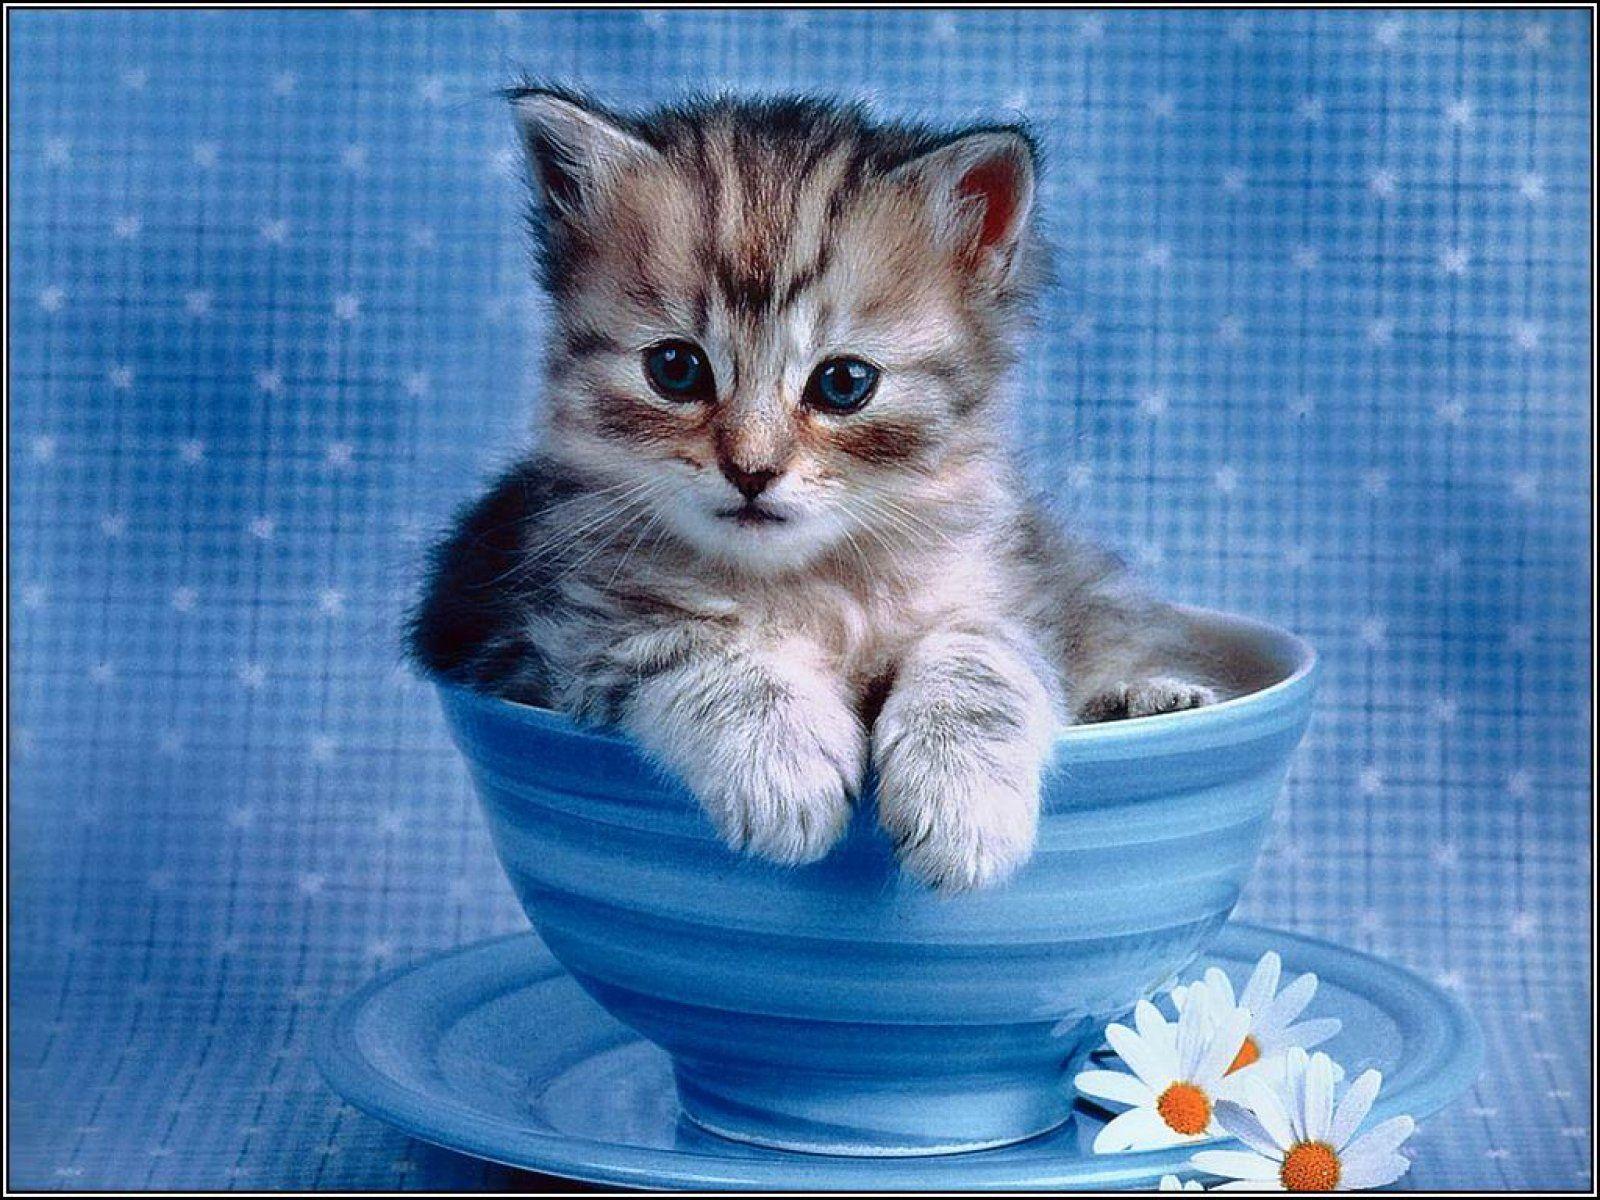 cute cats desktop wallpaper free obtain - hd images new | taylor